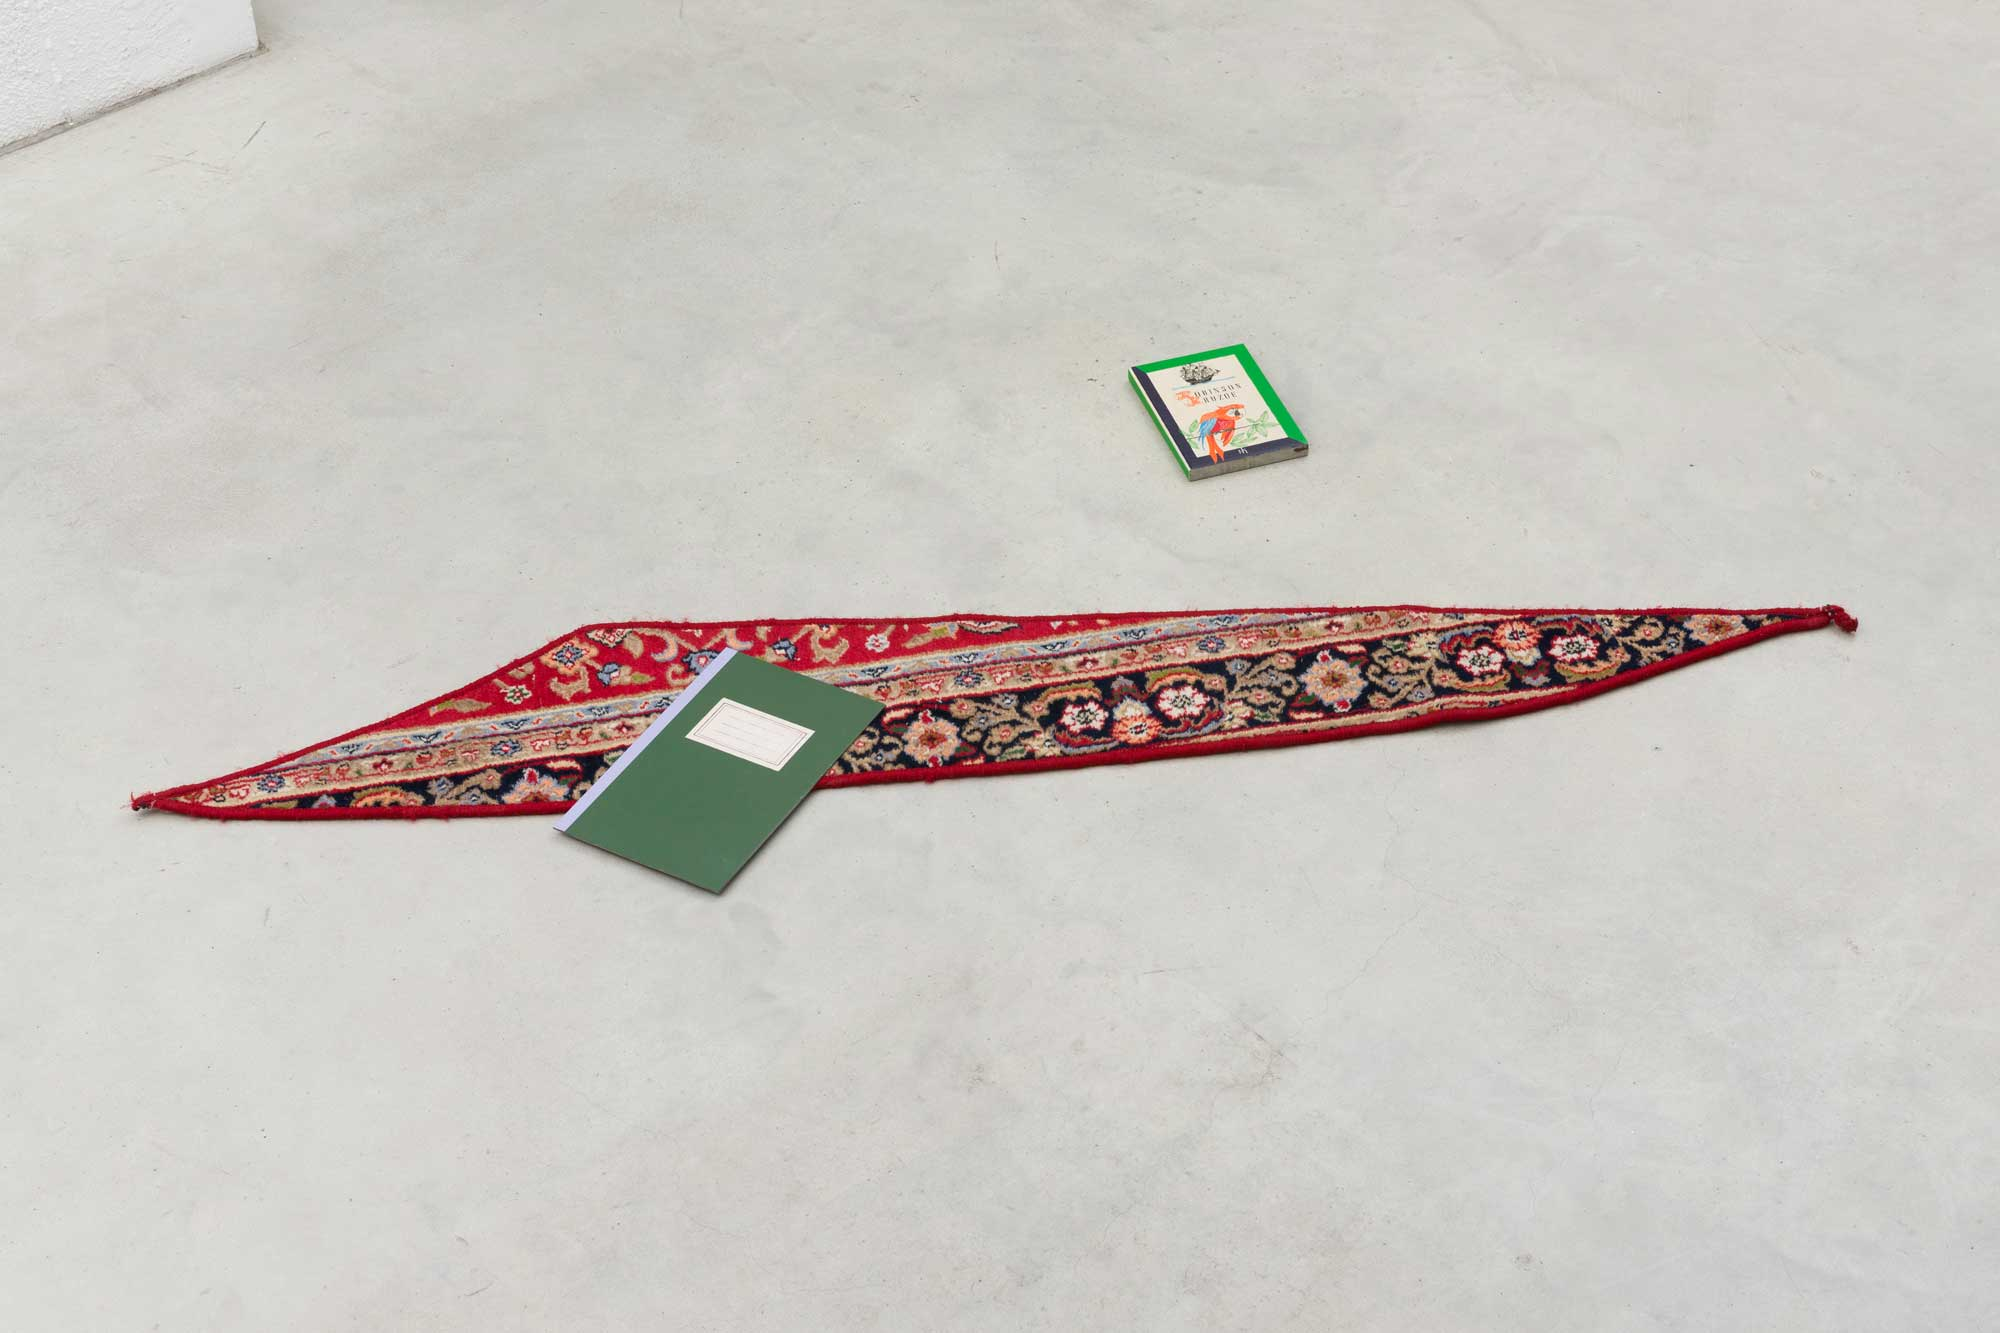 Marzena Nowak, Carpet Piece with Book and Notebook, 2014. Photo: Marcus Schneider